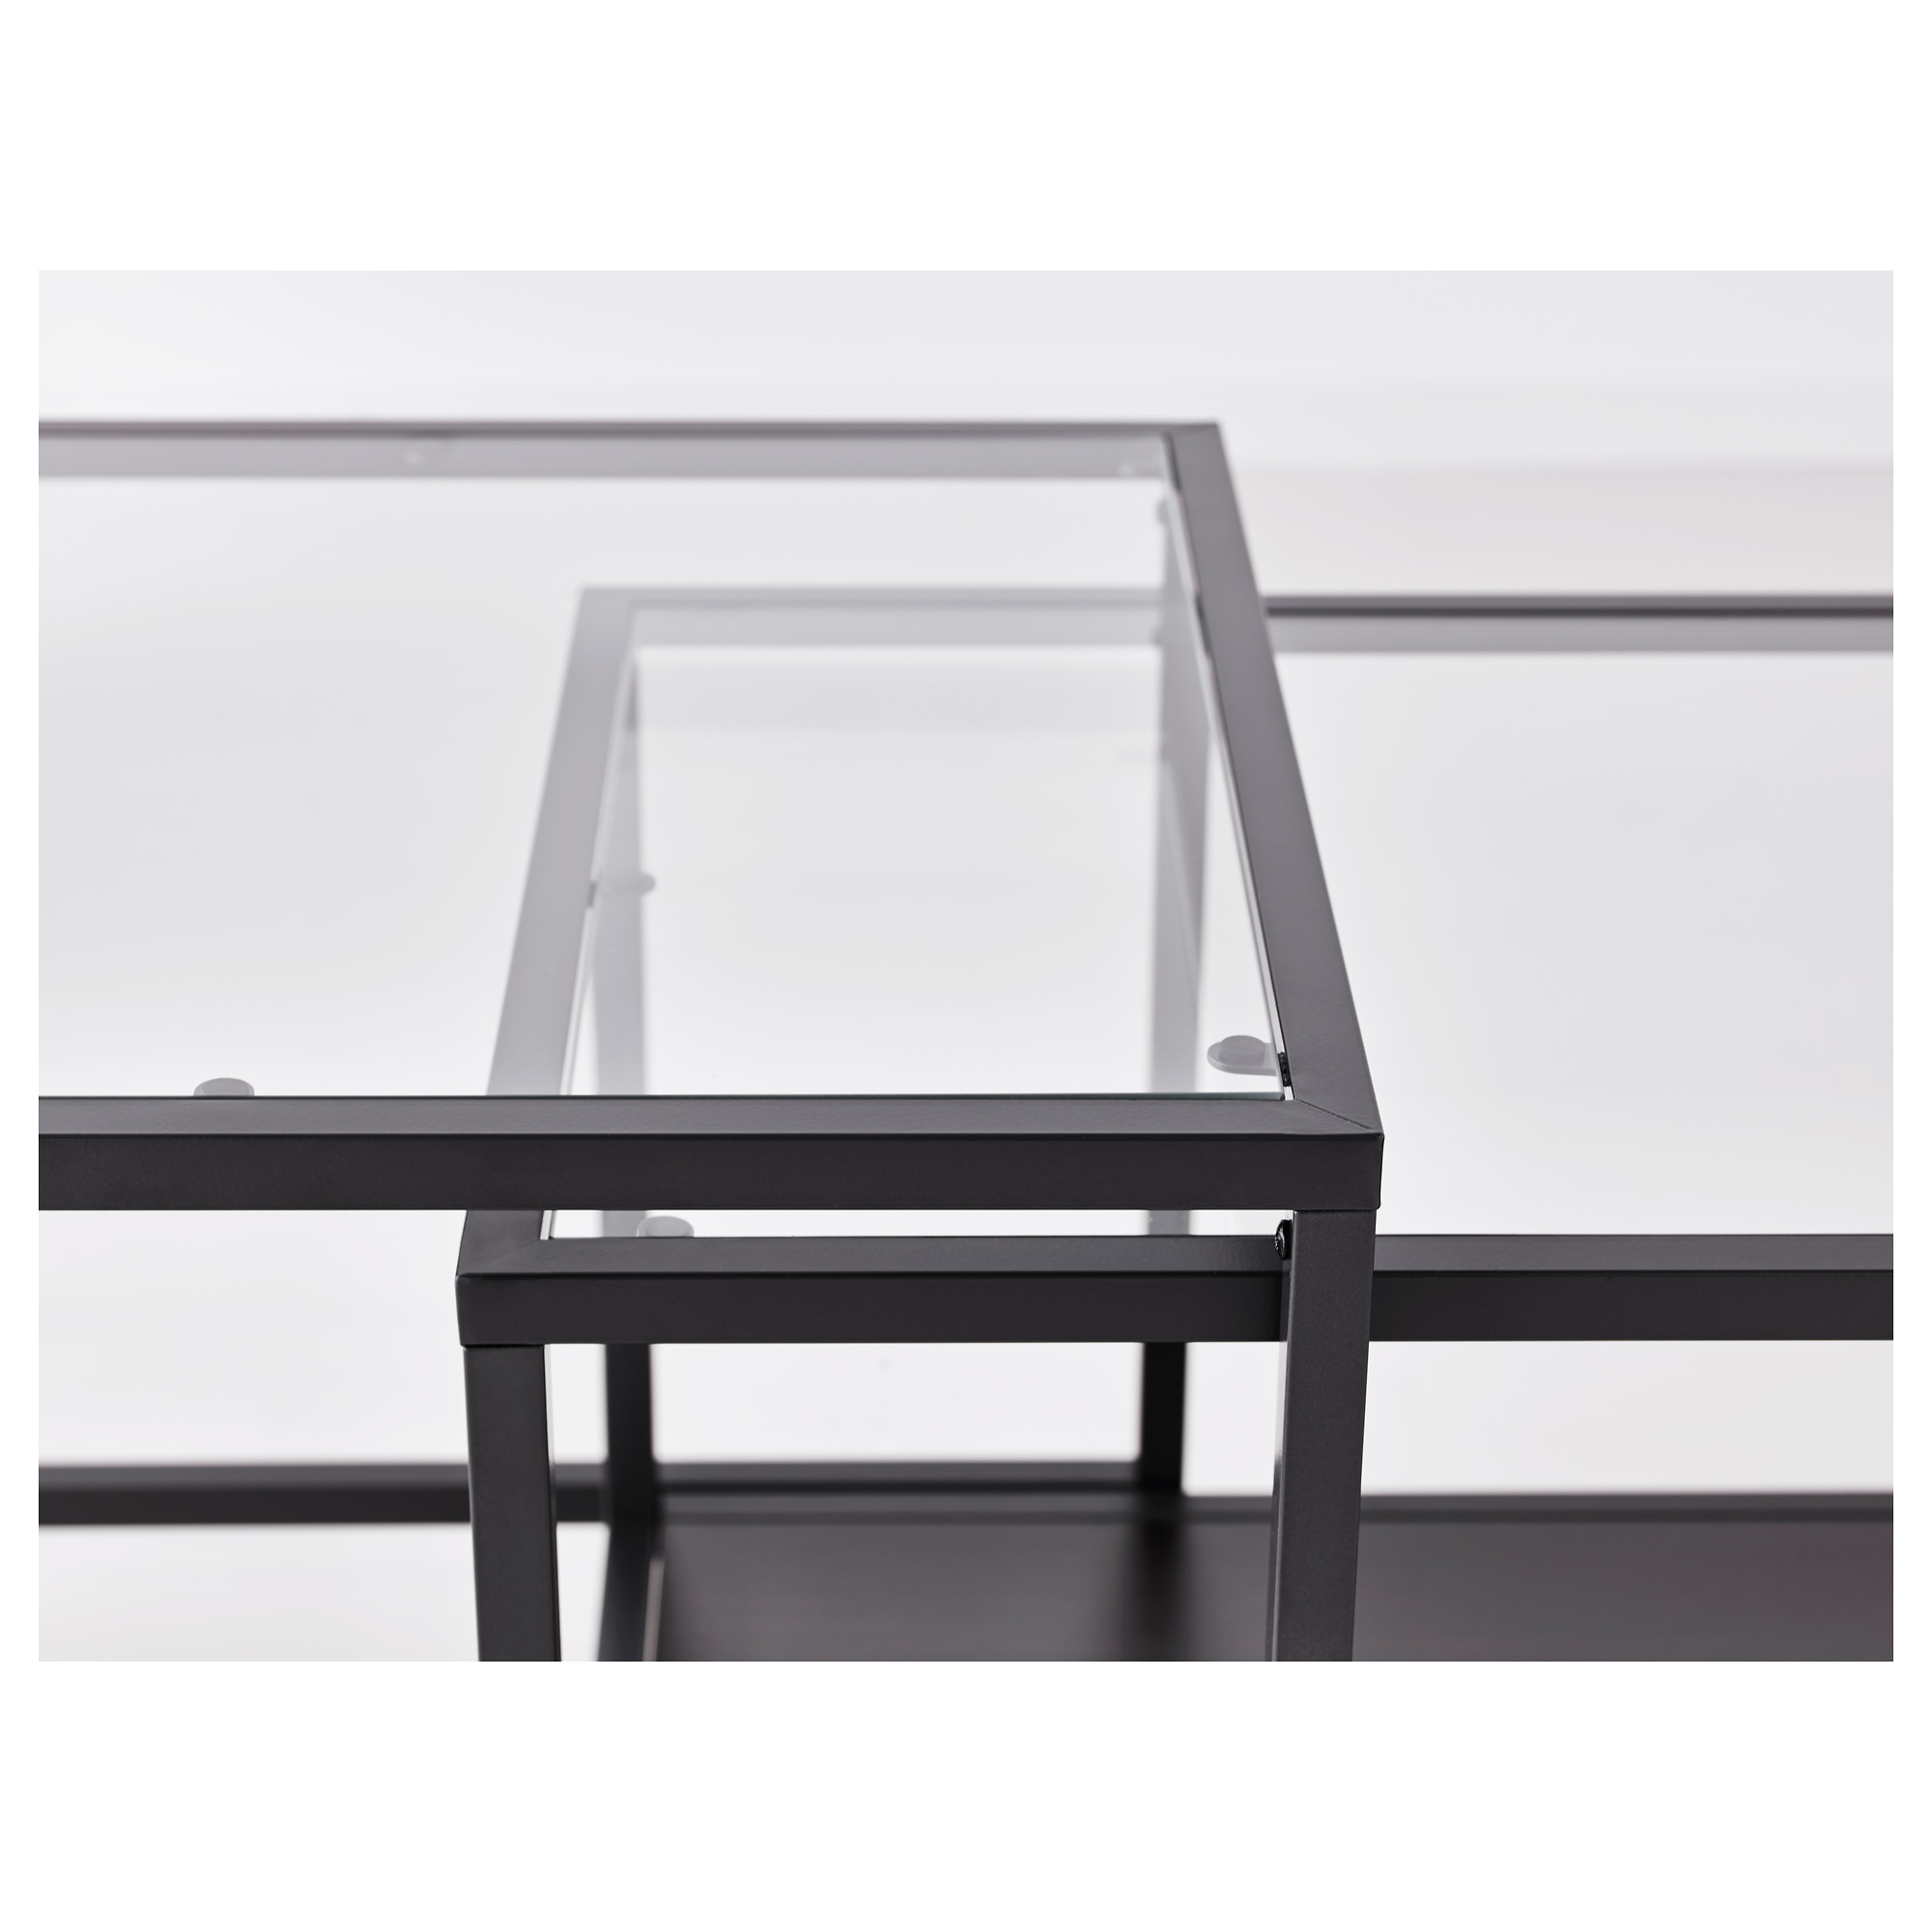 Vittsjo Bijzettafel Set Van 2 Zwartbruin Glas 90x50 Cm Ikea Bijzettafel Ikea Tafelbladen [ 2000 x 2000 Pixel ]